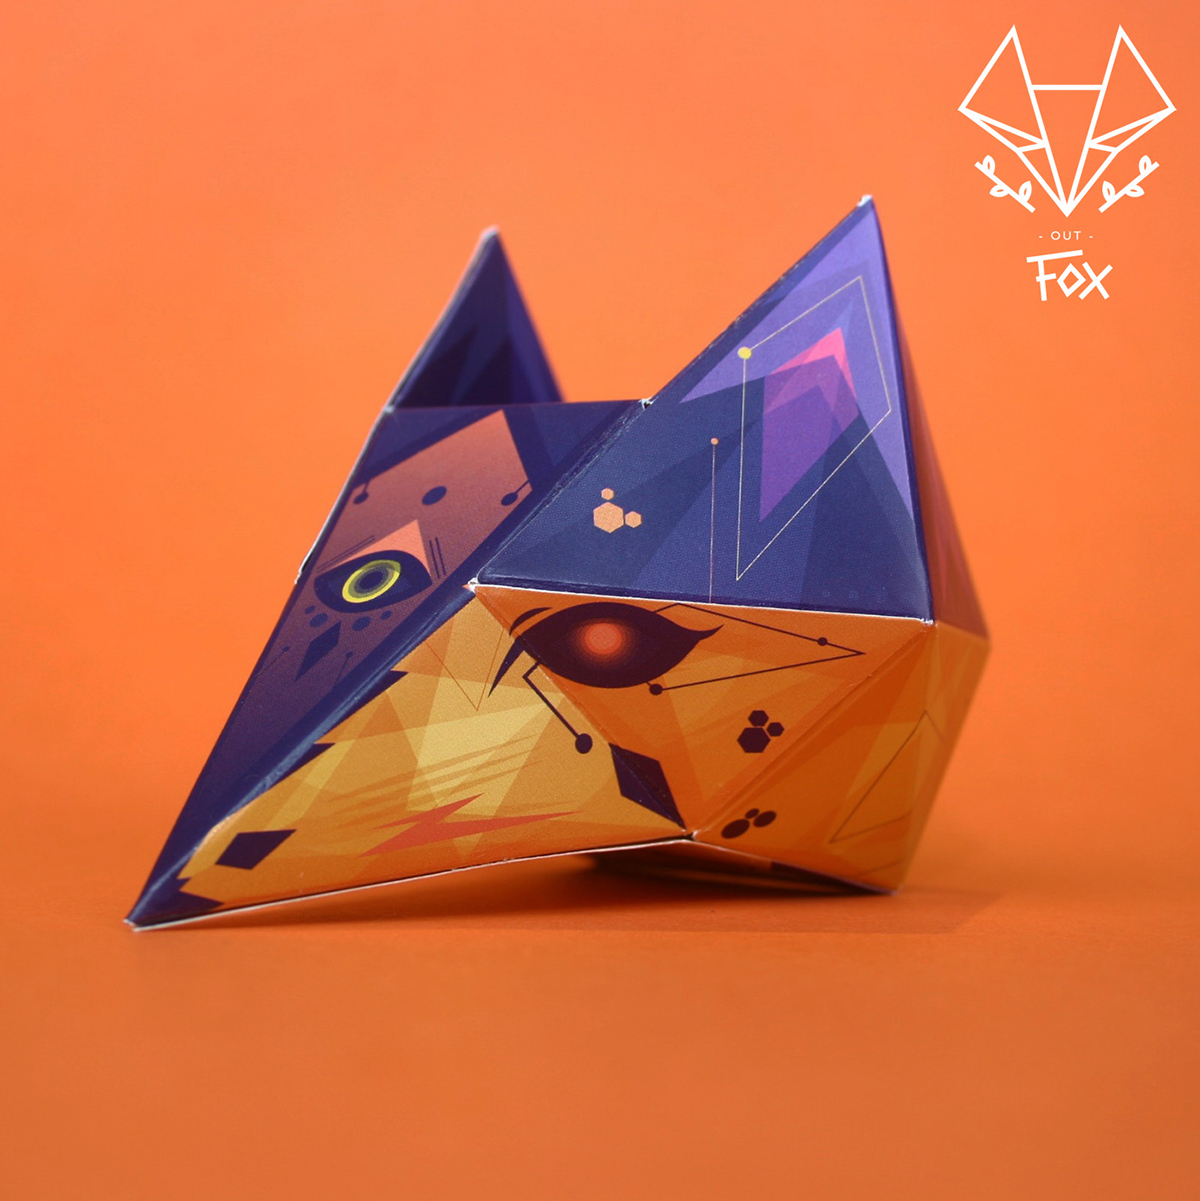 out fox FOX paper fox fox mask Halloween Dia De Muertos mascara zorro